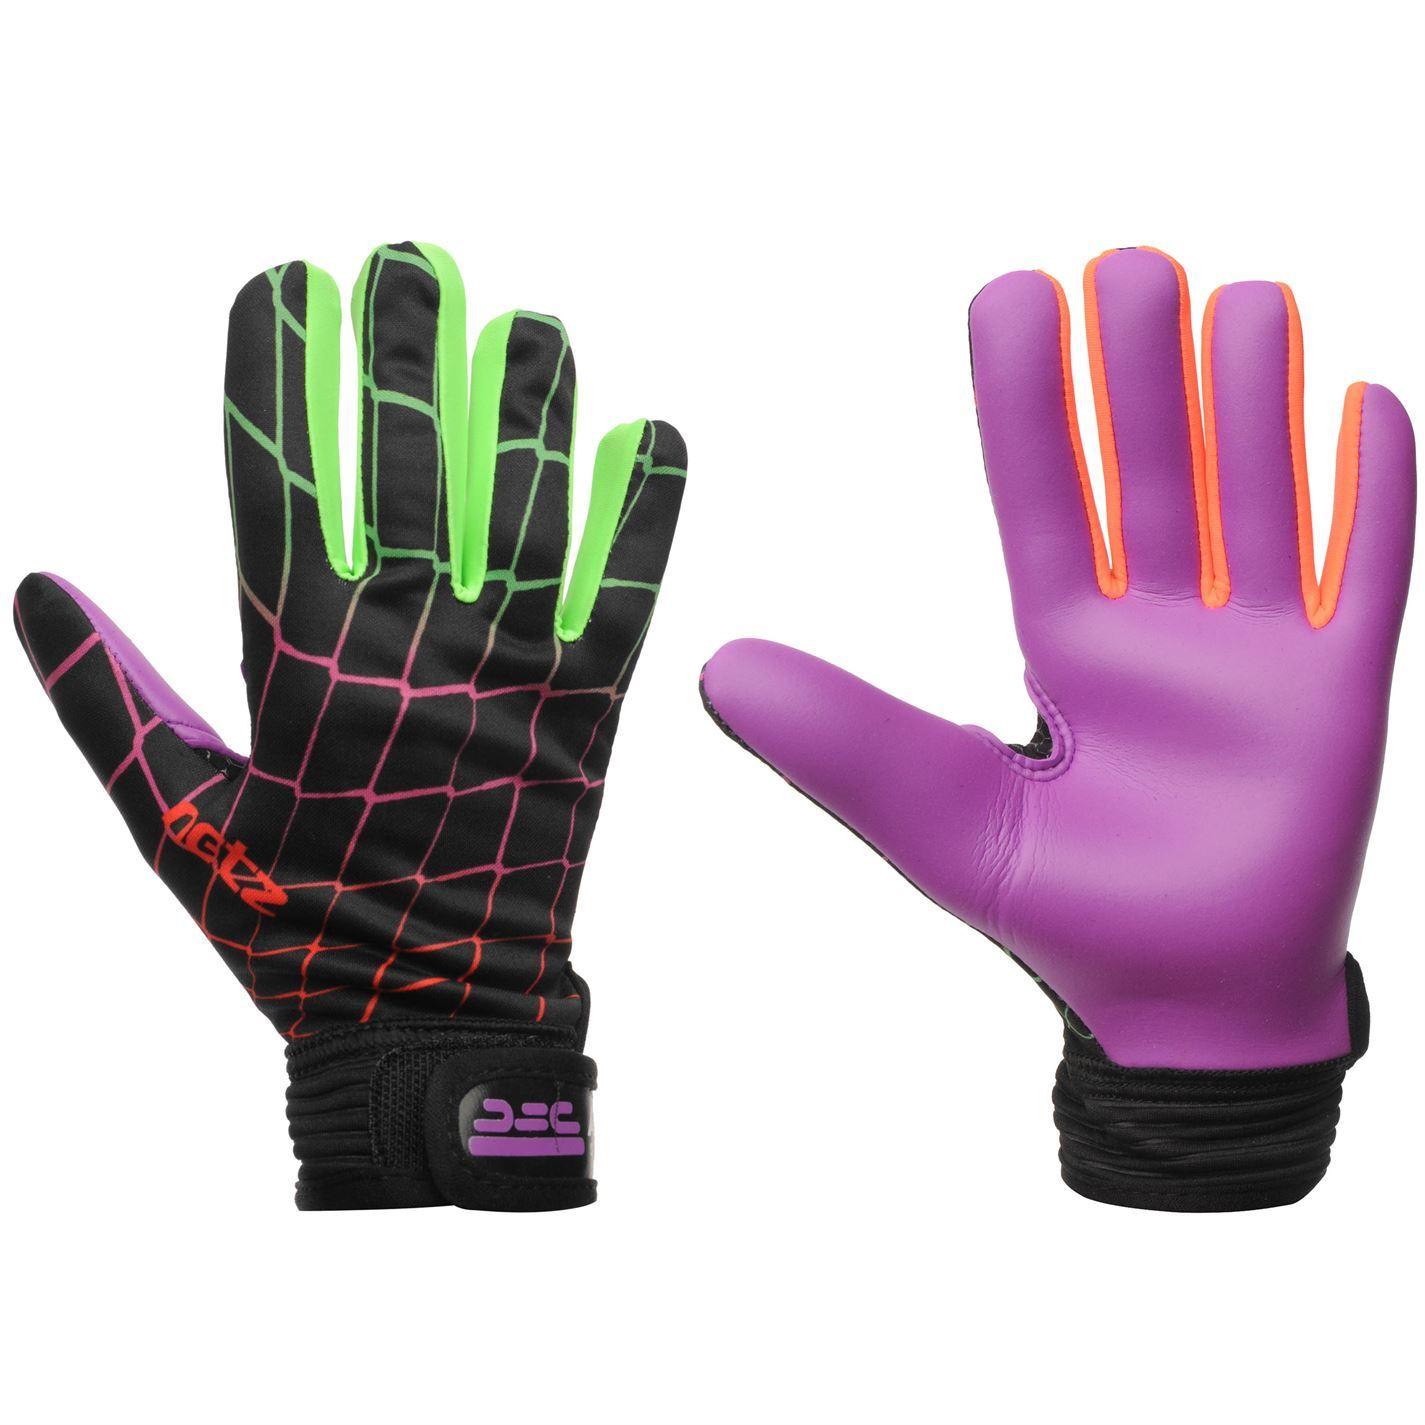 58f5c050709 ATAK Netz Goalkeeper Gloves Hands Protection Training Football Accessories  Green/orange S 830034